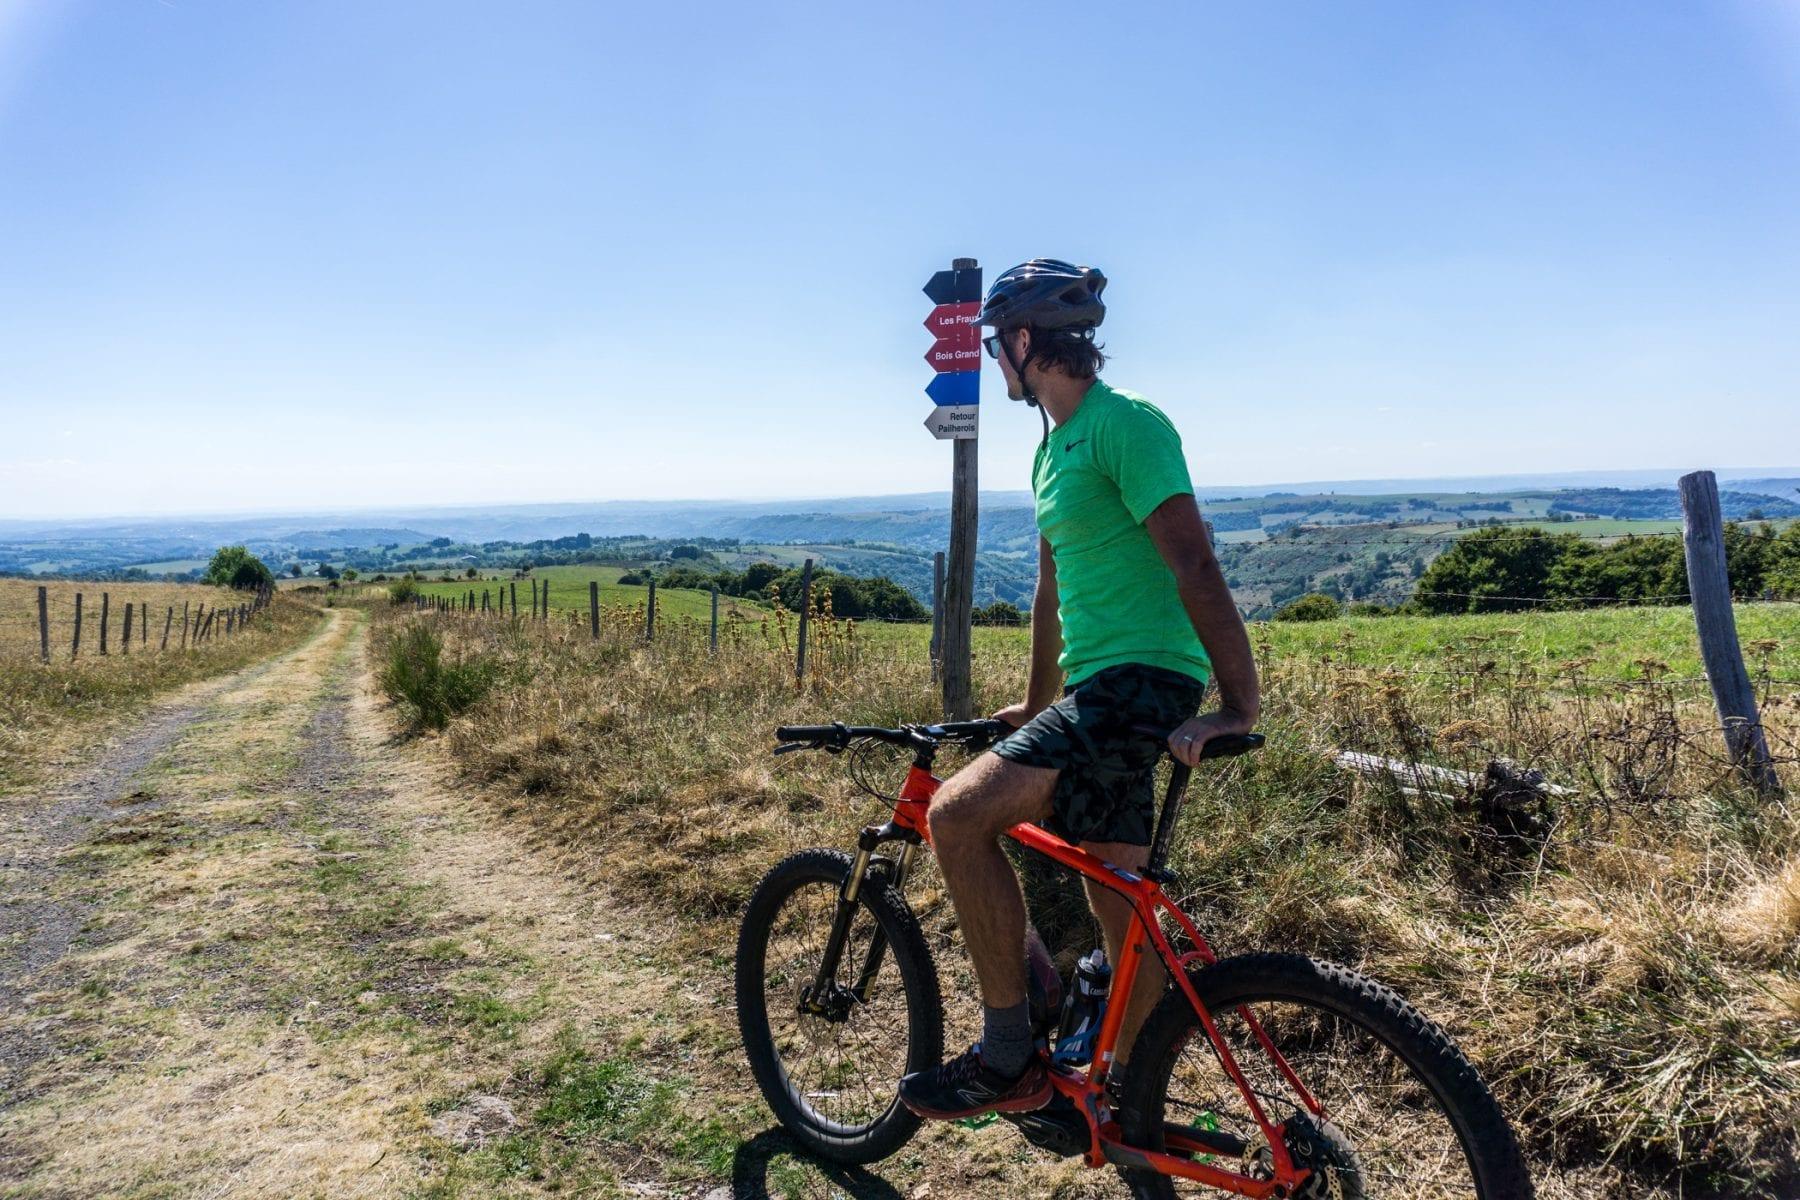 Cantal op de mountainbike 2